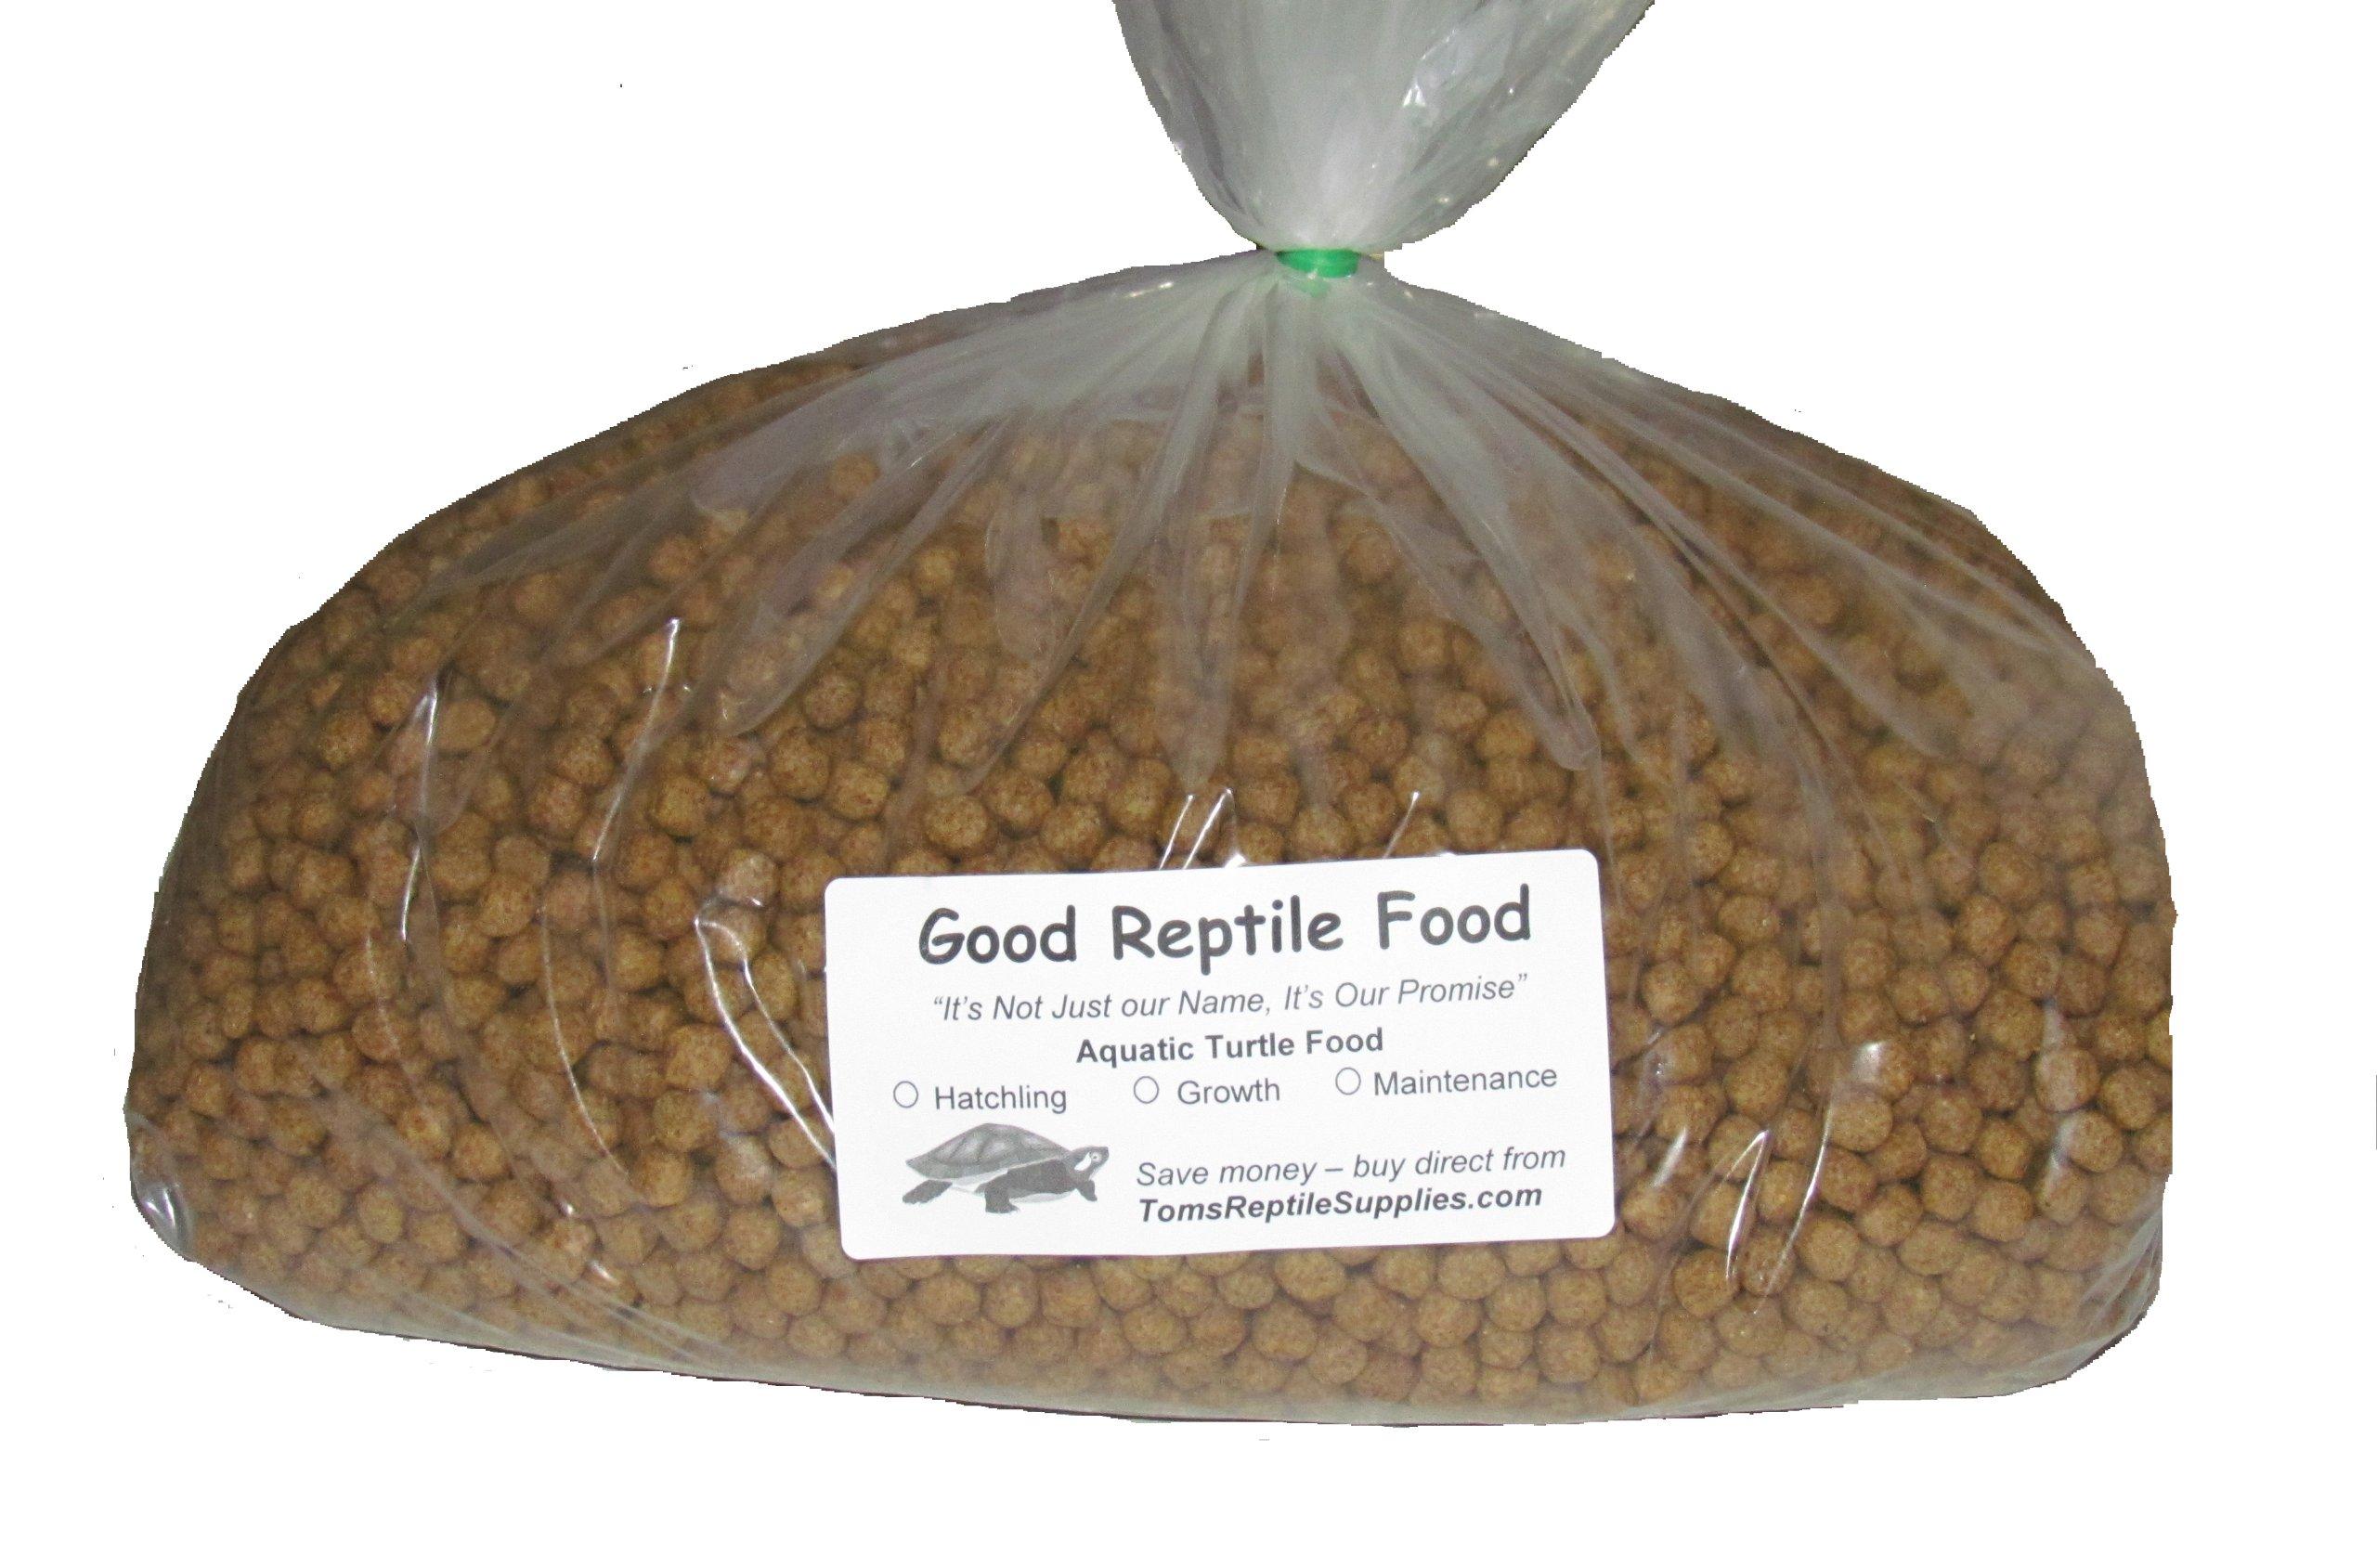 Aquatic Turtle Food Maintenance 6 Lbs Bulk for Adult Aquatic Turtles New 1/4 Inch Size Pellet by Good Reptile Food